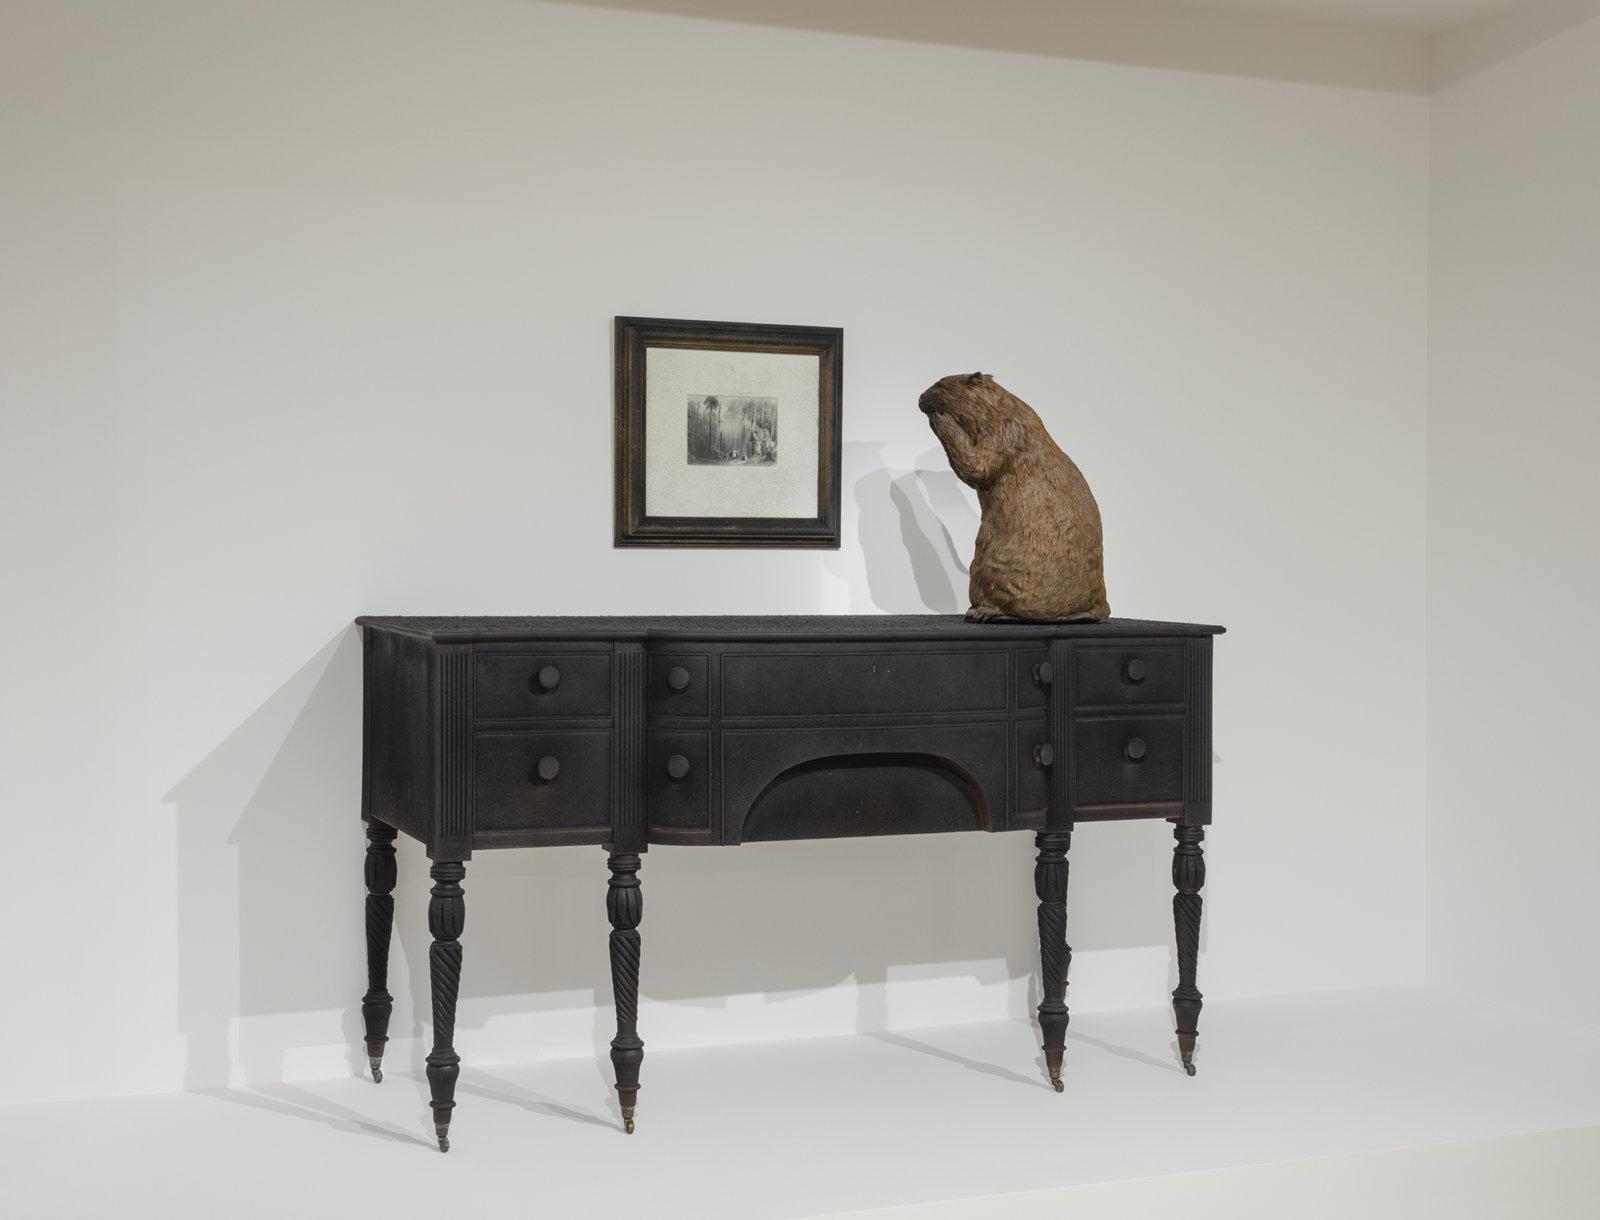 Liz Magor, Provincial Sideboard, 1993, mixed media, 67 x 72 x 30 in. (169 x 183 x 76 cm). Installation view, Habitude, Musée d'art contemporain de Montréal, 2016 by Liz Magor